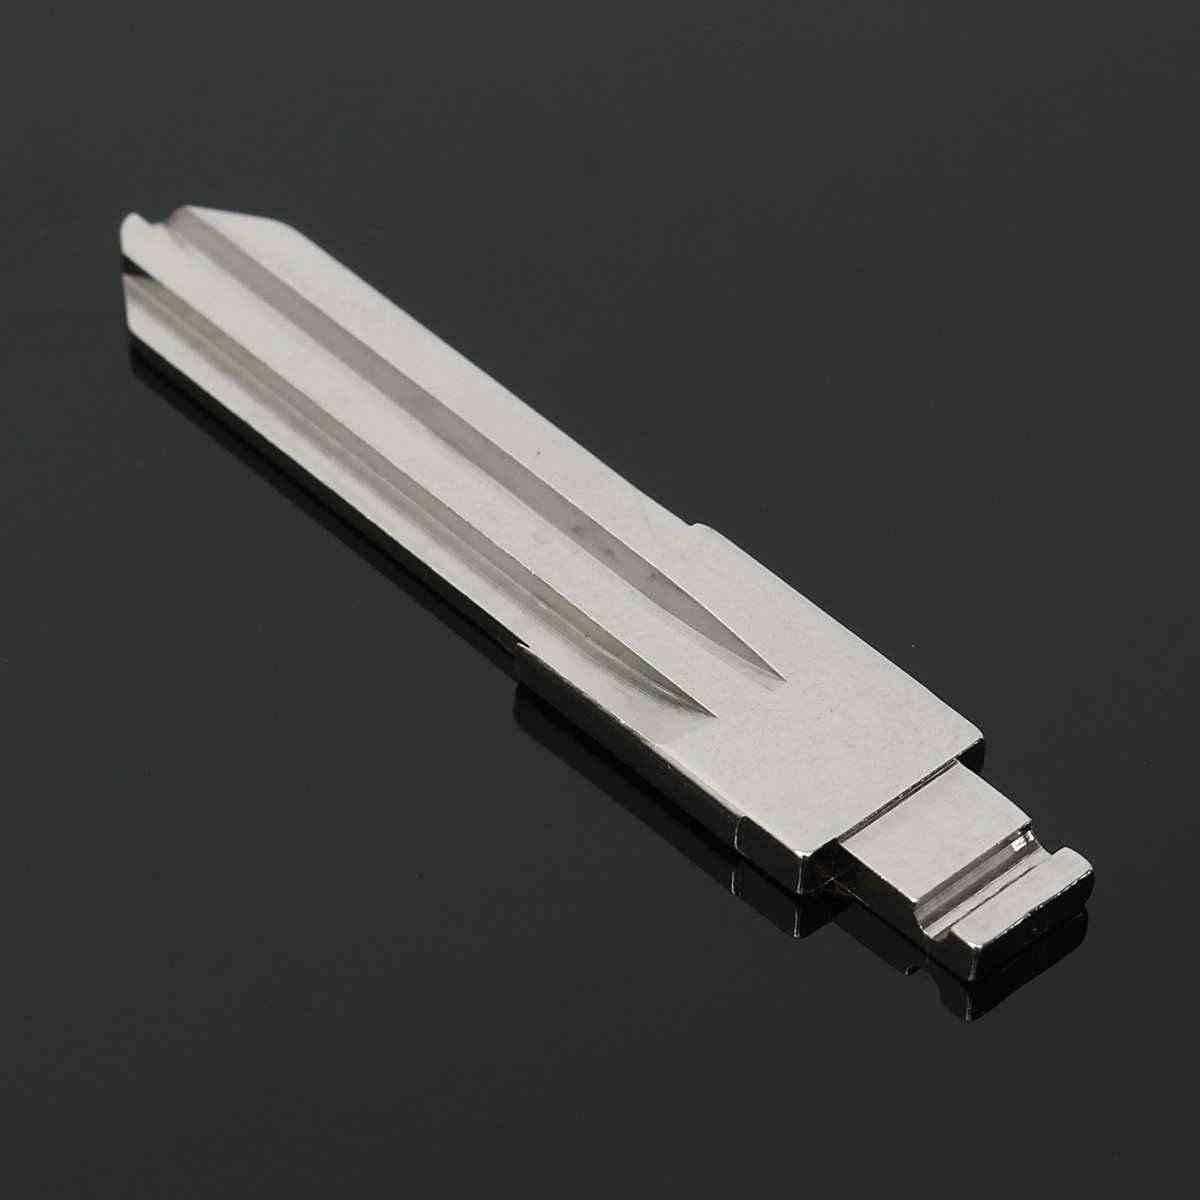 1 PC L5 Kunci Mobil Bladeuncut Mobil Pengganti Kunci Blade Case untuk Lada Shell Kosong Cvover Tanpa Chip